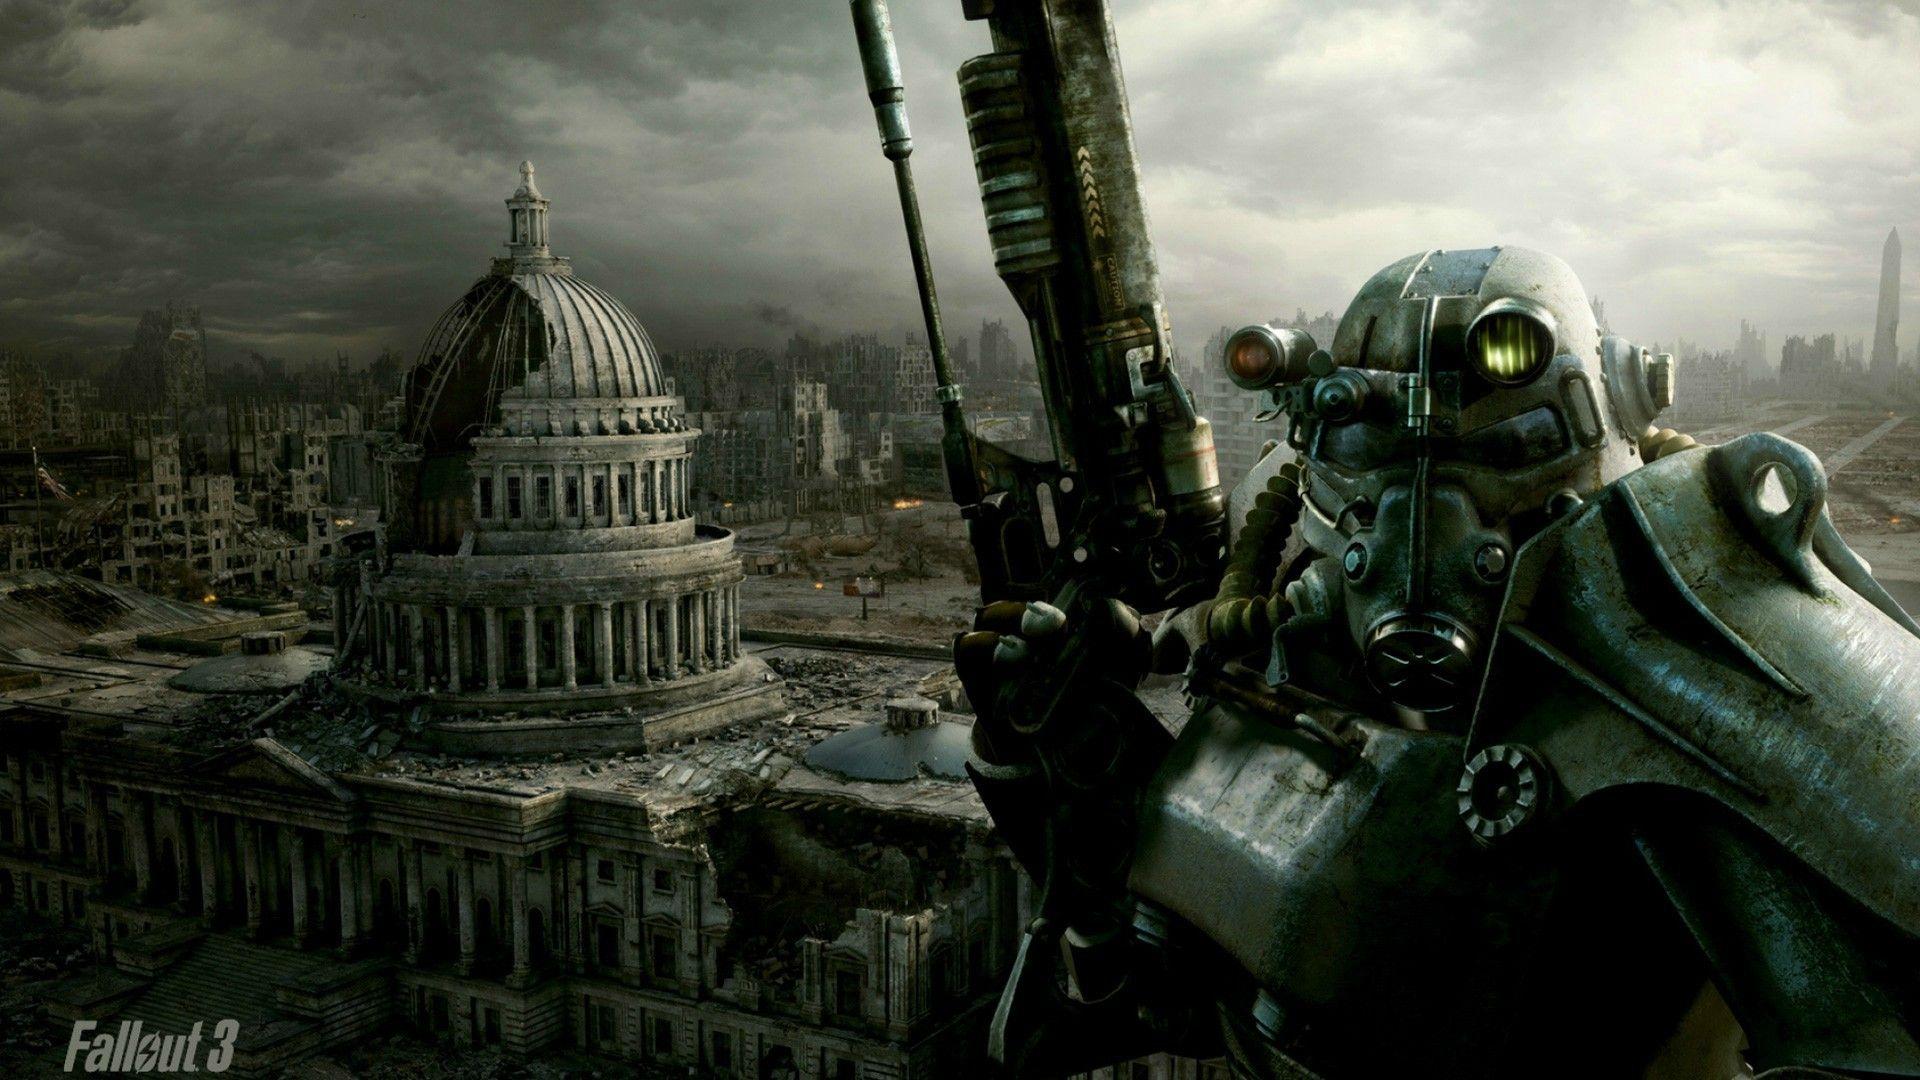 Imgur Fallout Wallpaper Fallout Art Fallout 3 Wallpaper